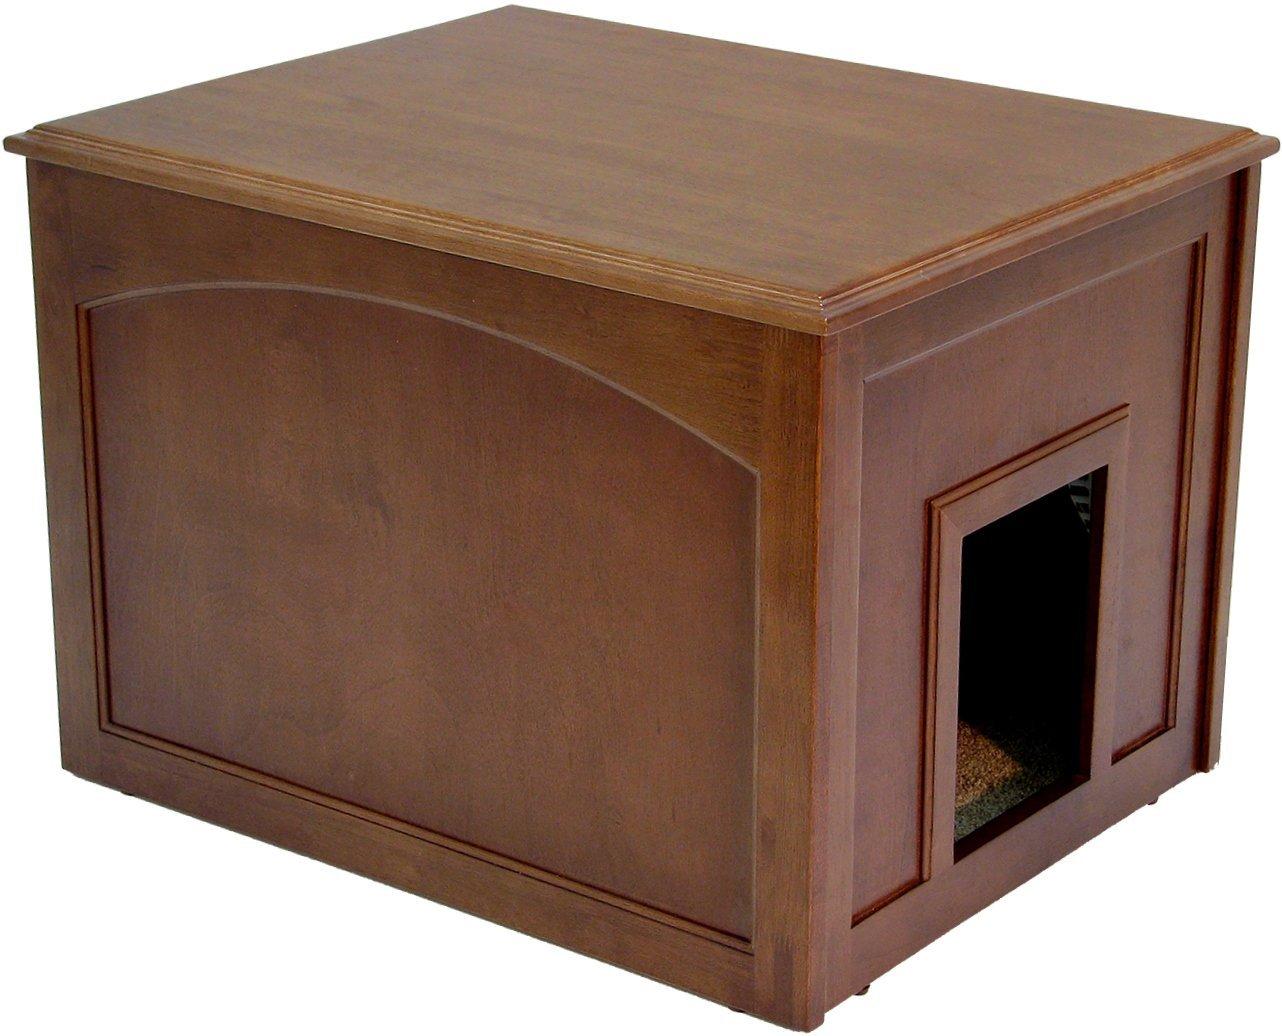 Mahogany Small Mahogany Small Crown Pet Products Doggie Den Cabinet Indoor Doghouse, Mahogany